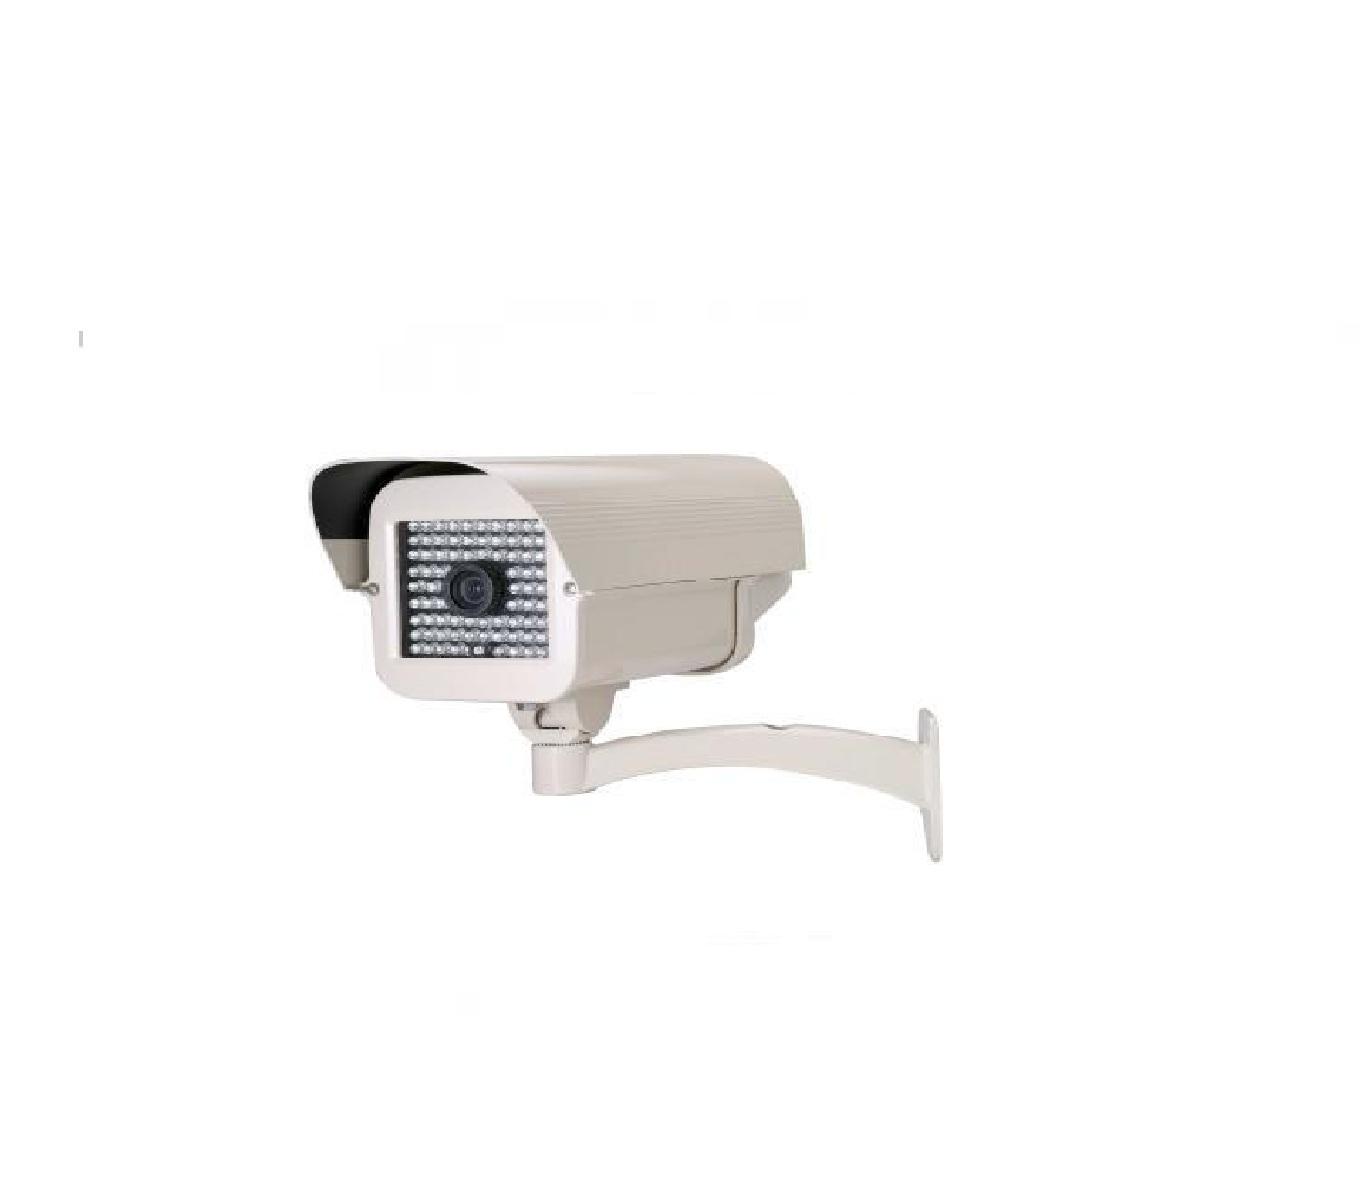 Camera trụ hồng ngoại Fine ICX-3450V4